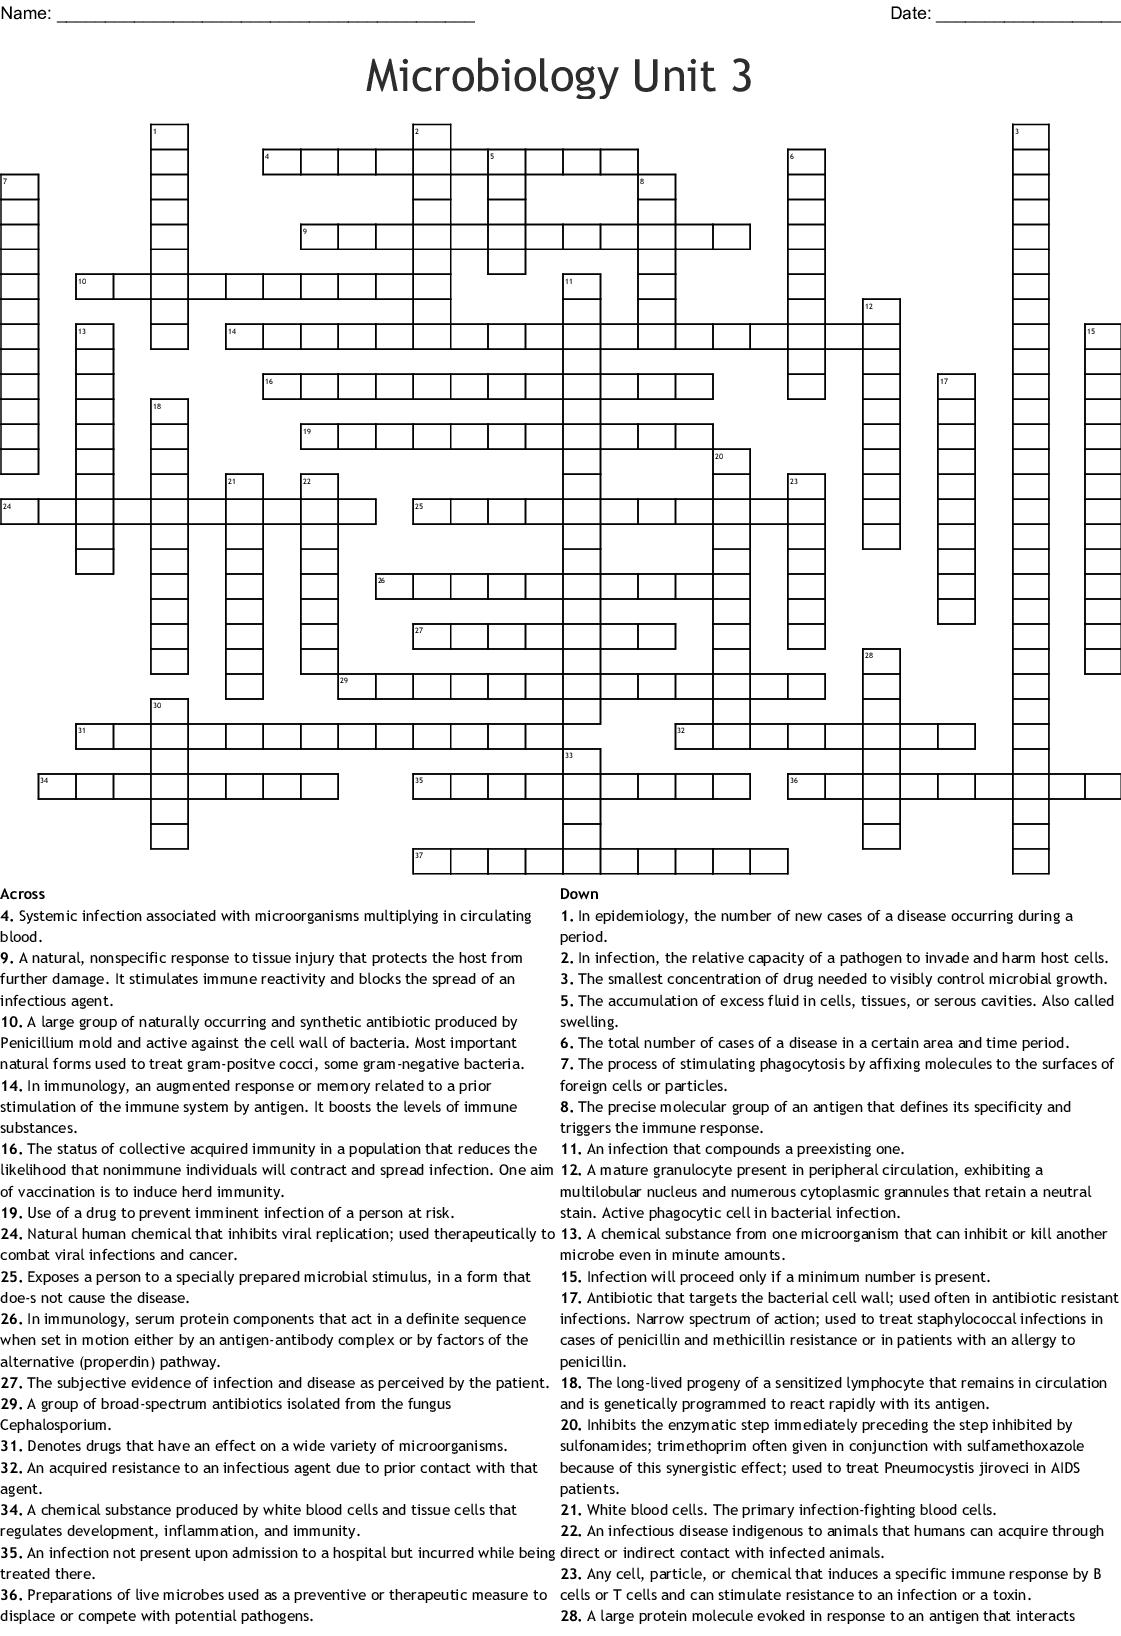 Microbiology Unit 3 Crossword